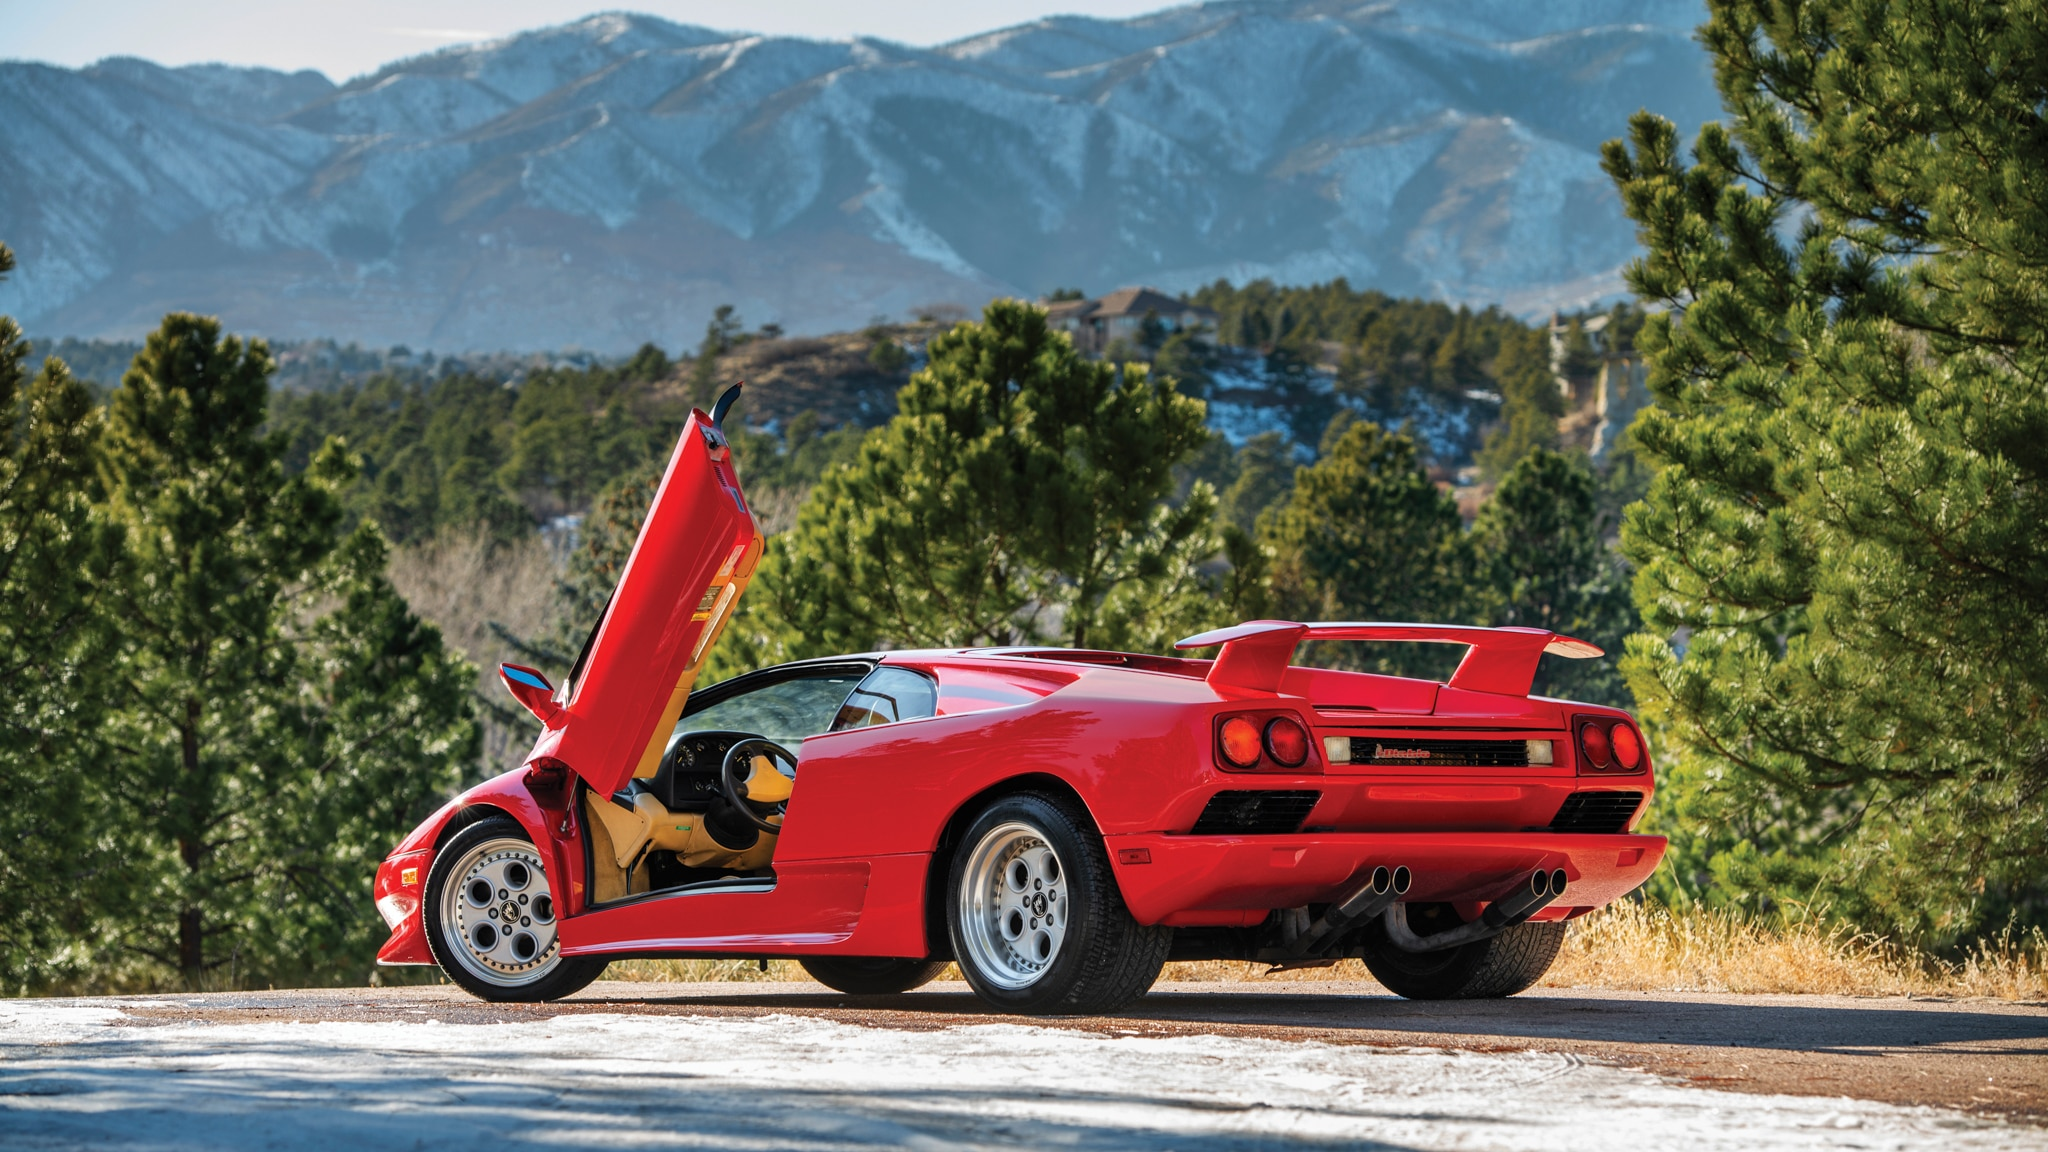 RM Sotheby's Palm Beach Online Auction Results, Part 1 - Automobile